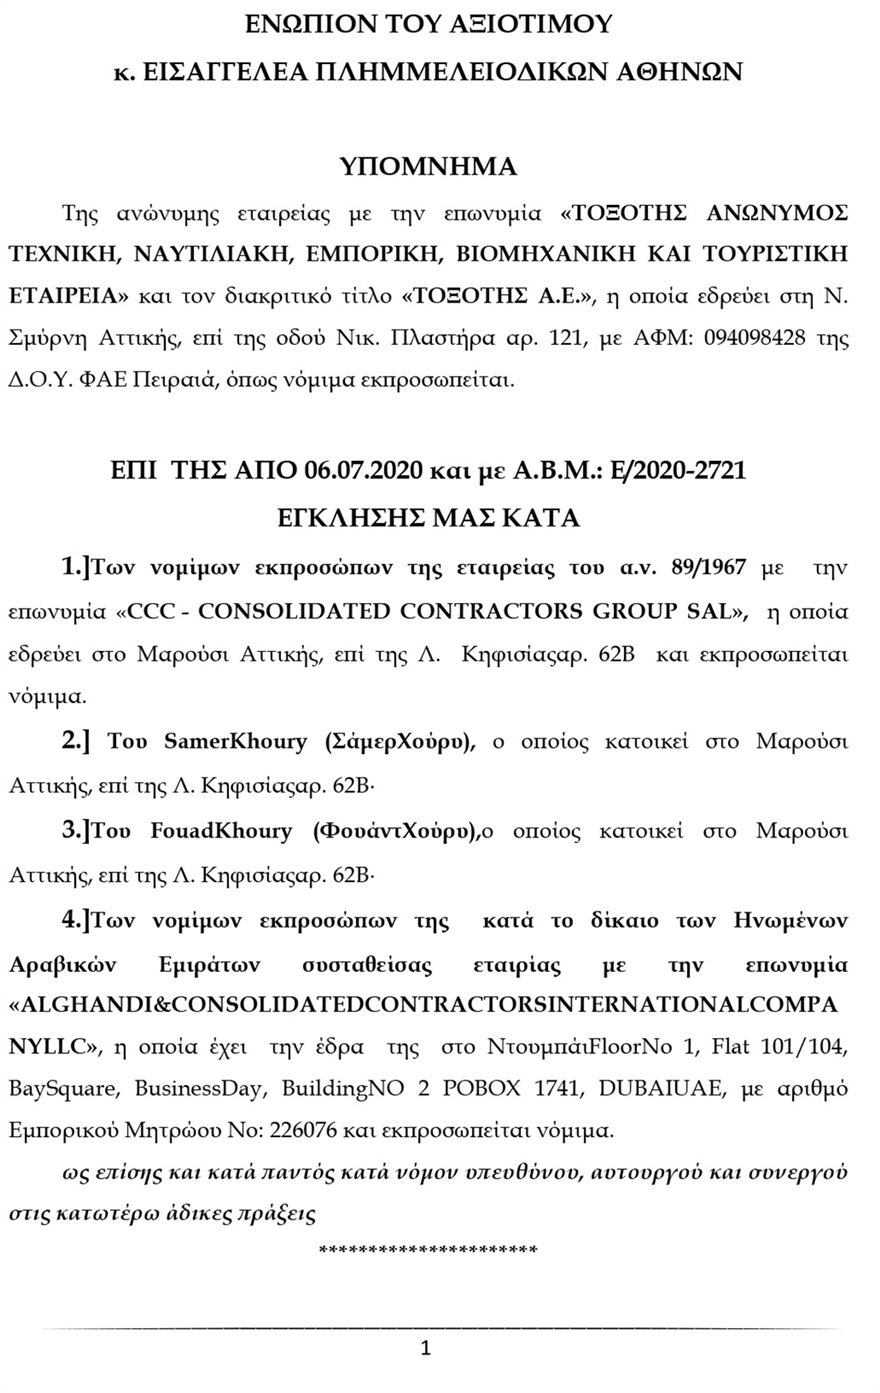 ypomnima-1